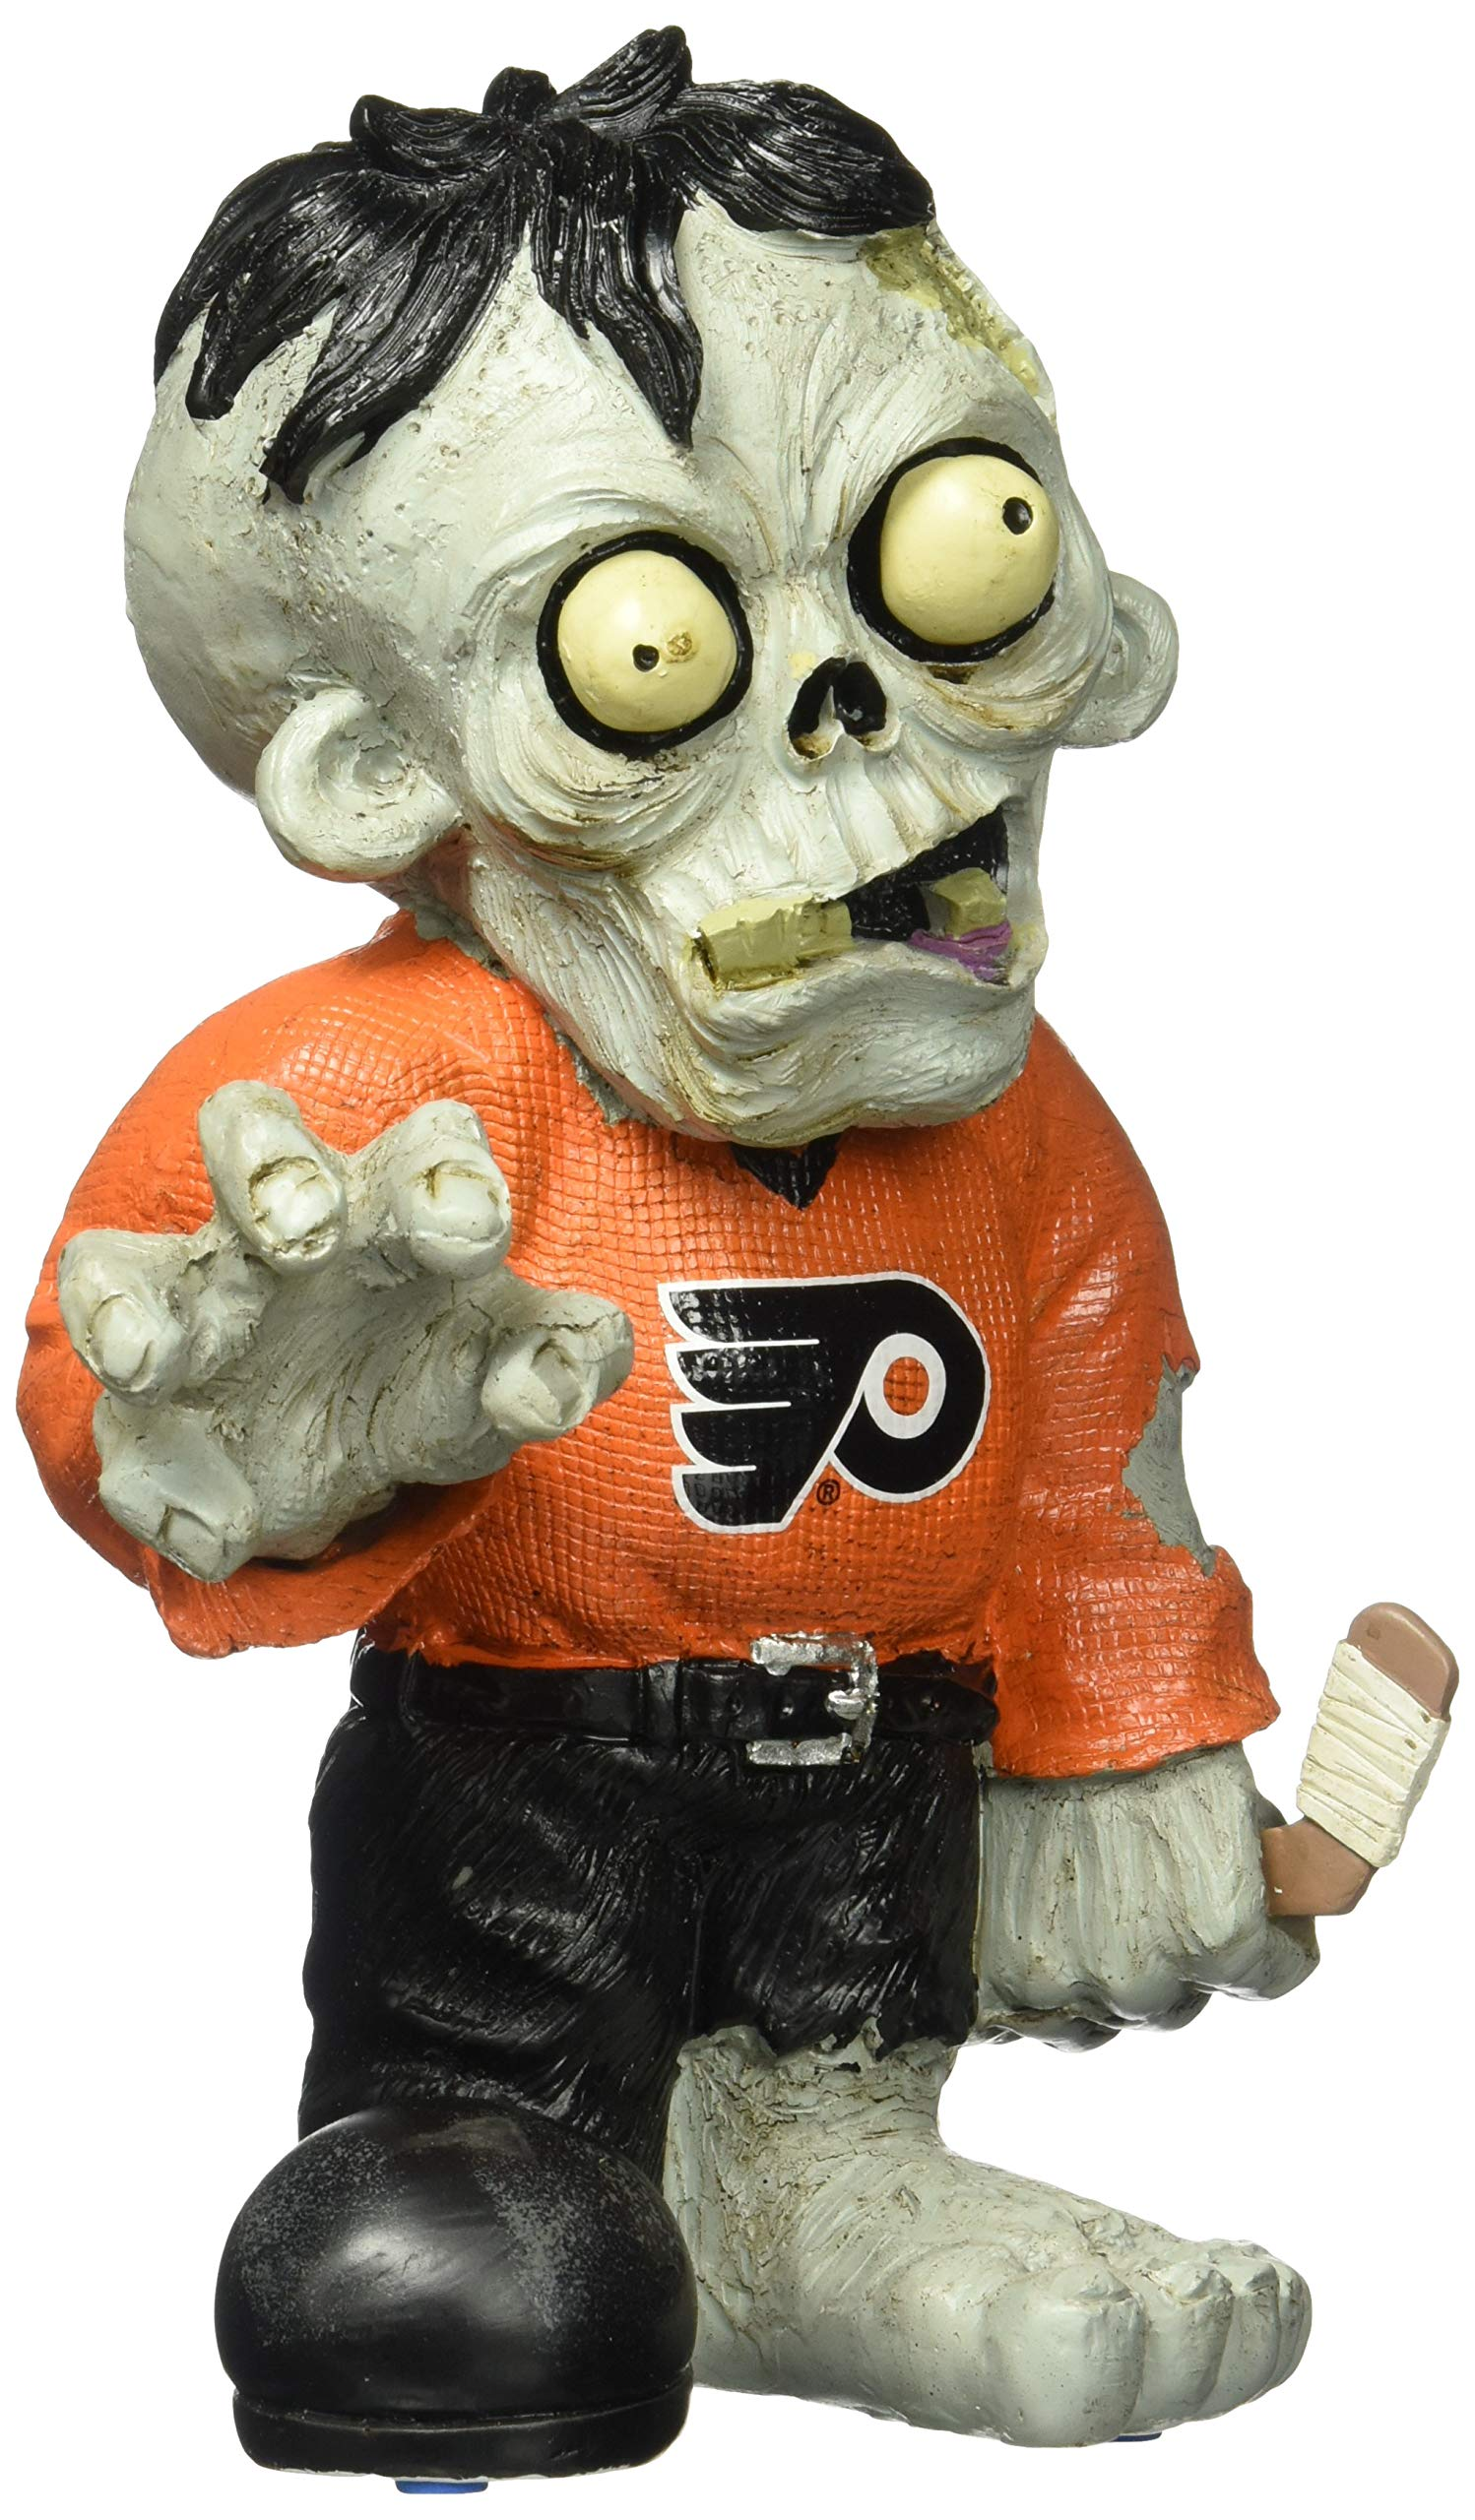 NHL Philadelphia Flyers Pro Team Zombie Figurine